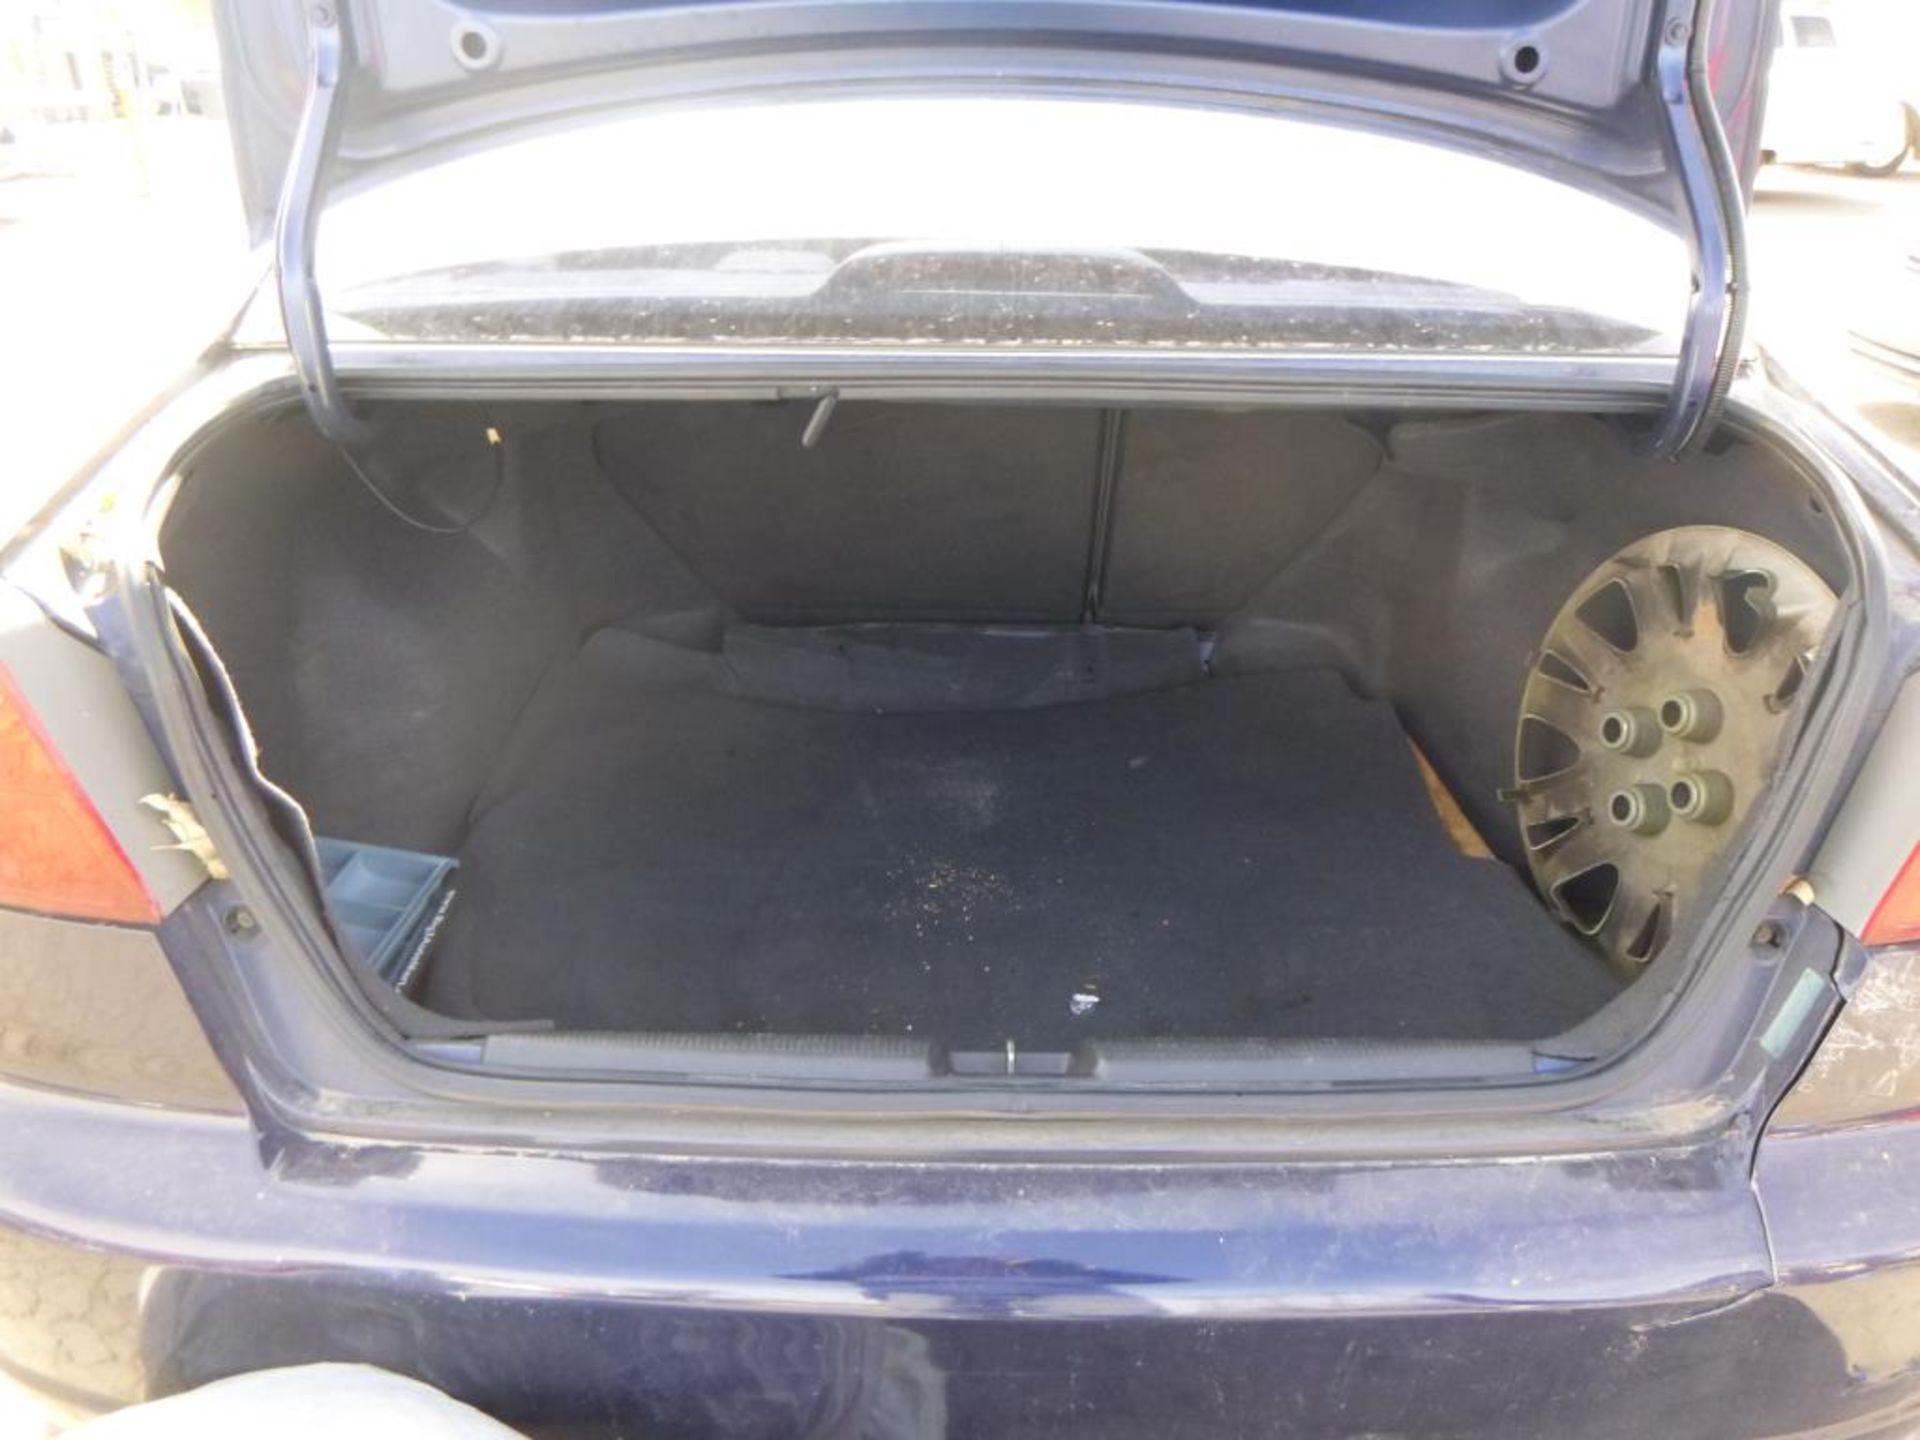 2004 Honda Civic - Image 6 of 14